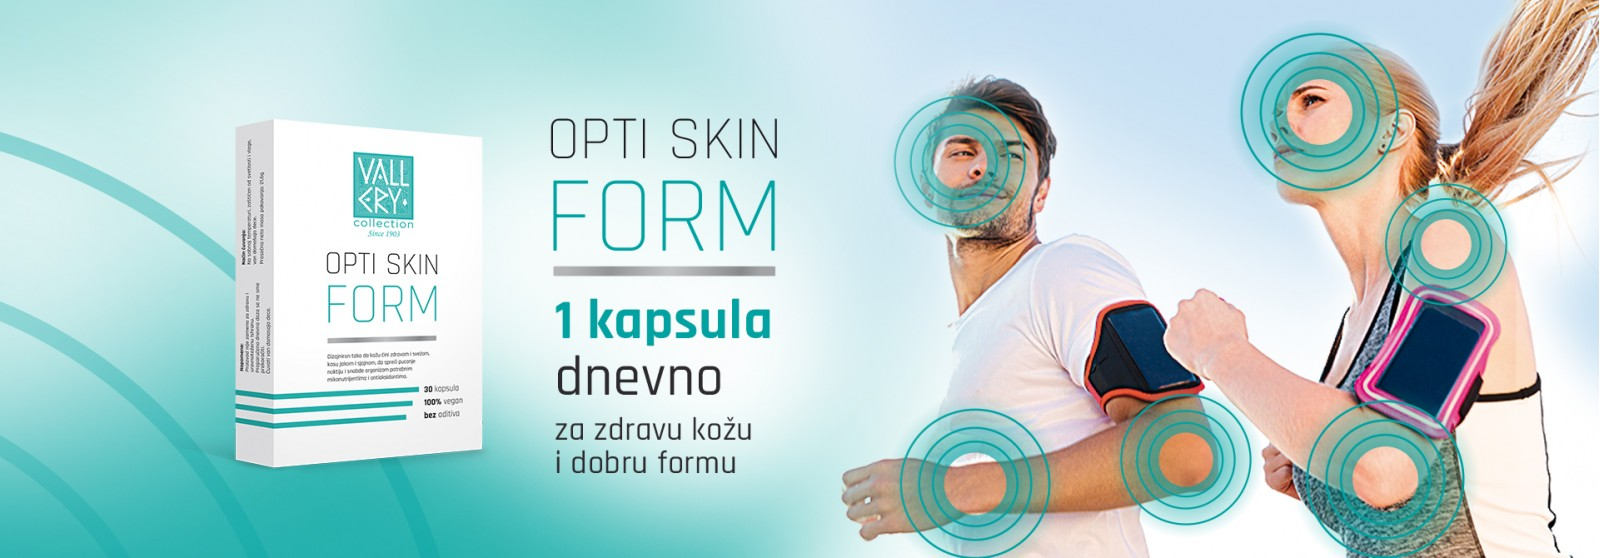 Opti Skin